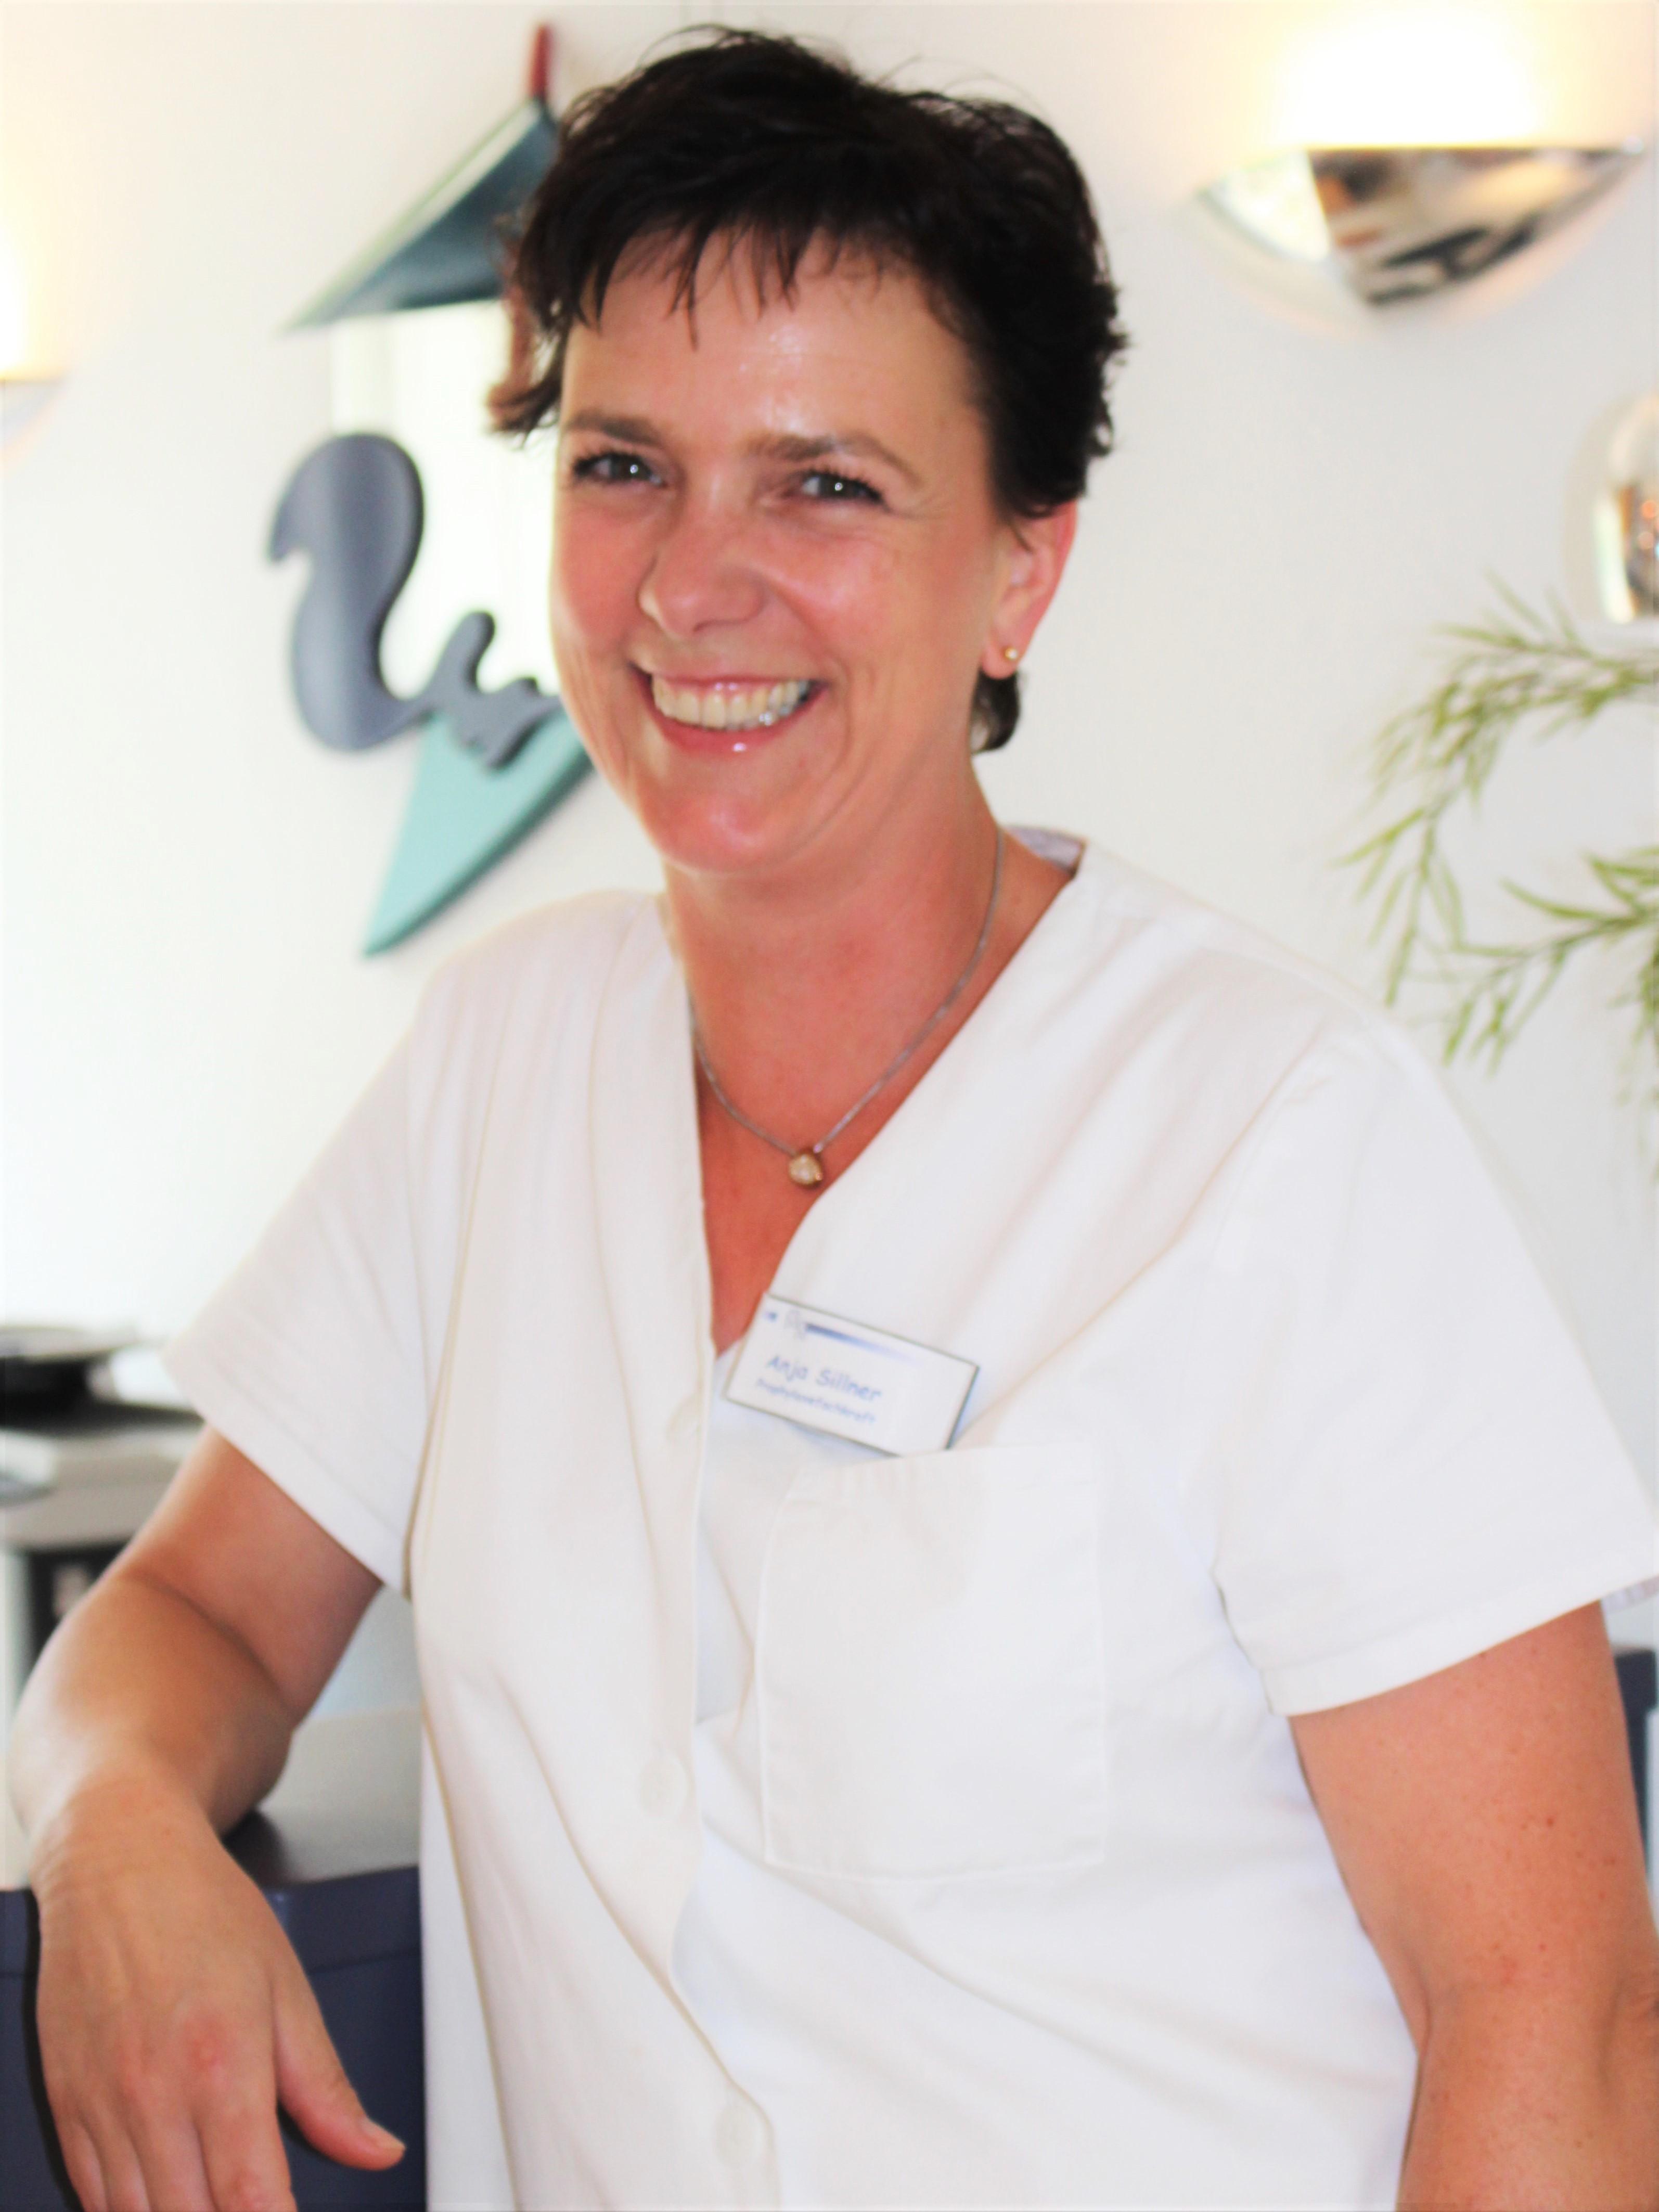 Anja Sillner